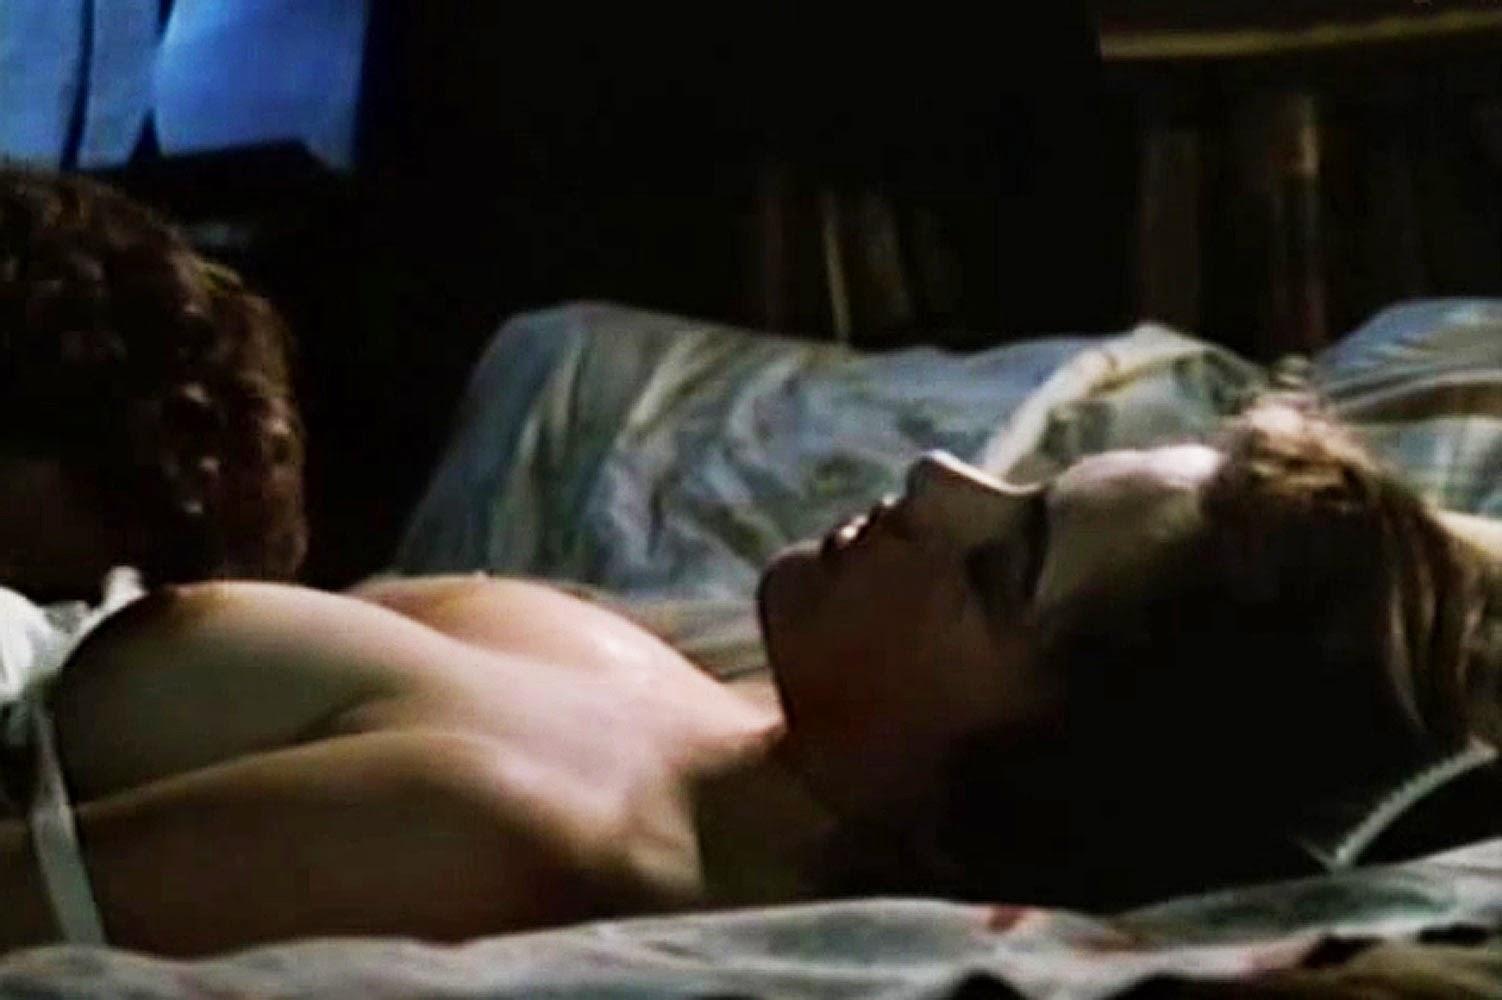 Christina ricci nude boobs from prozac nation movie - 29 part 7